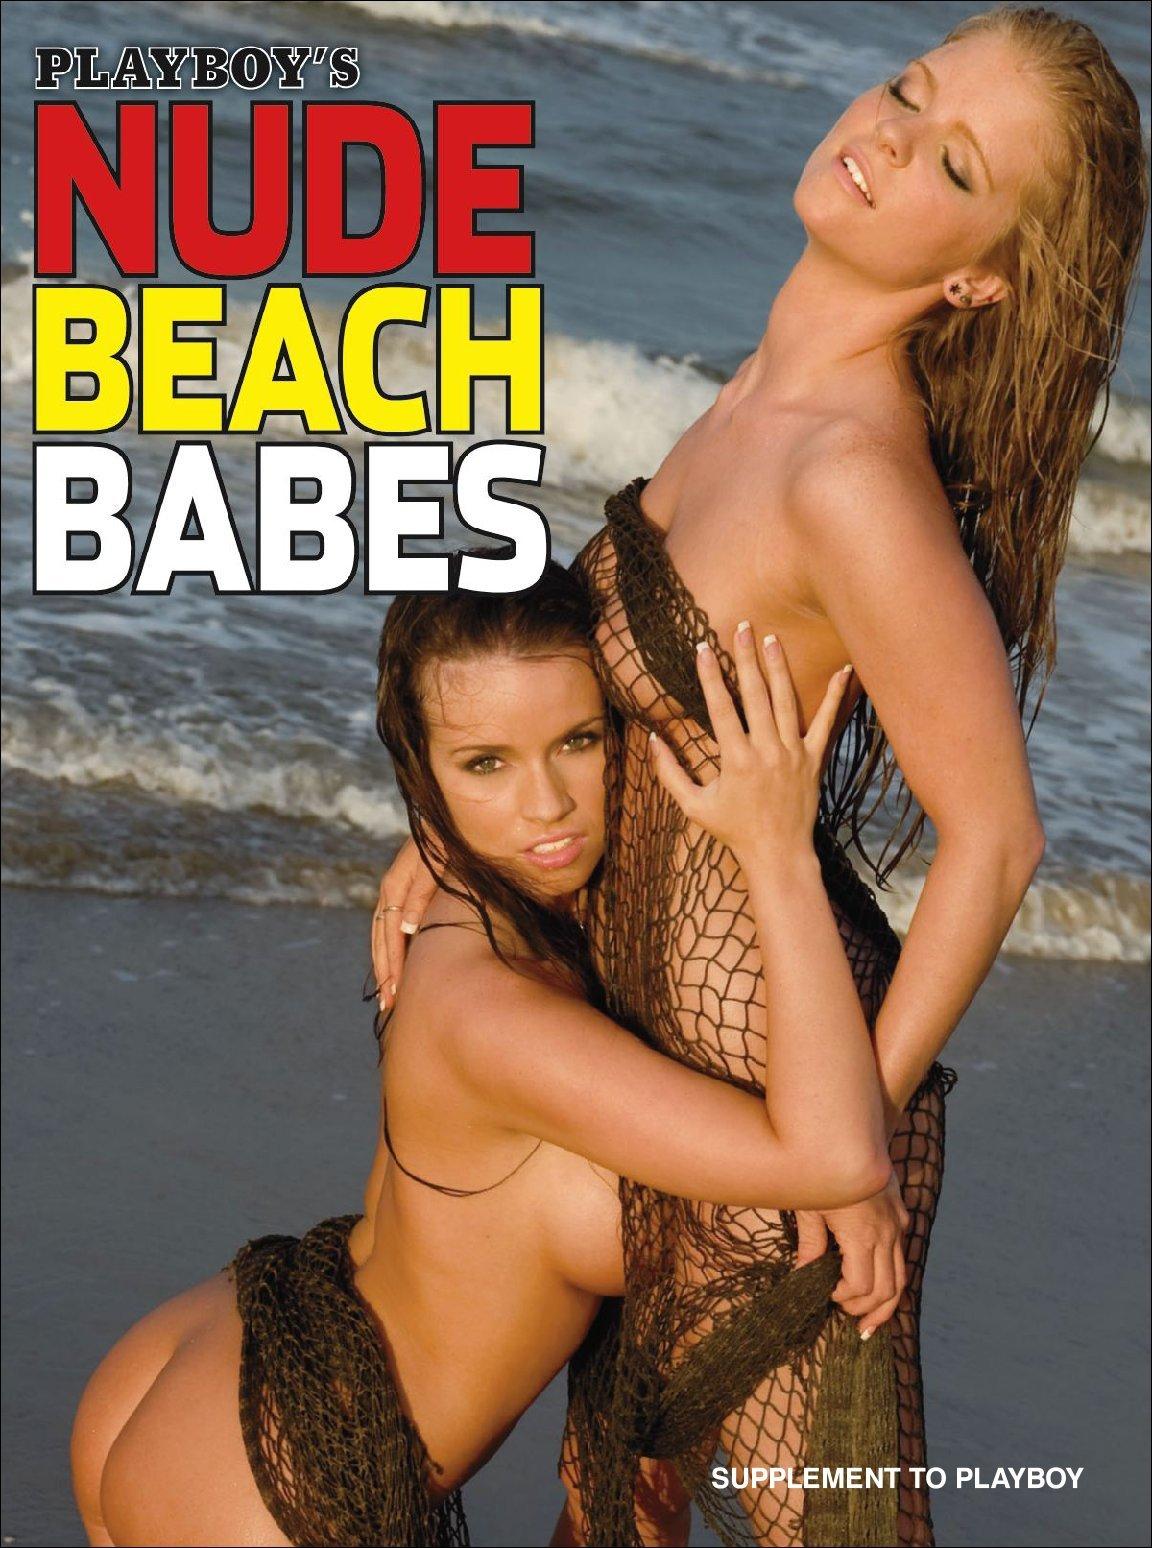 art-girls-playboy-sorority-girls-nude-picture